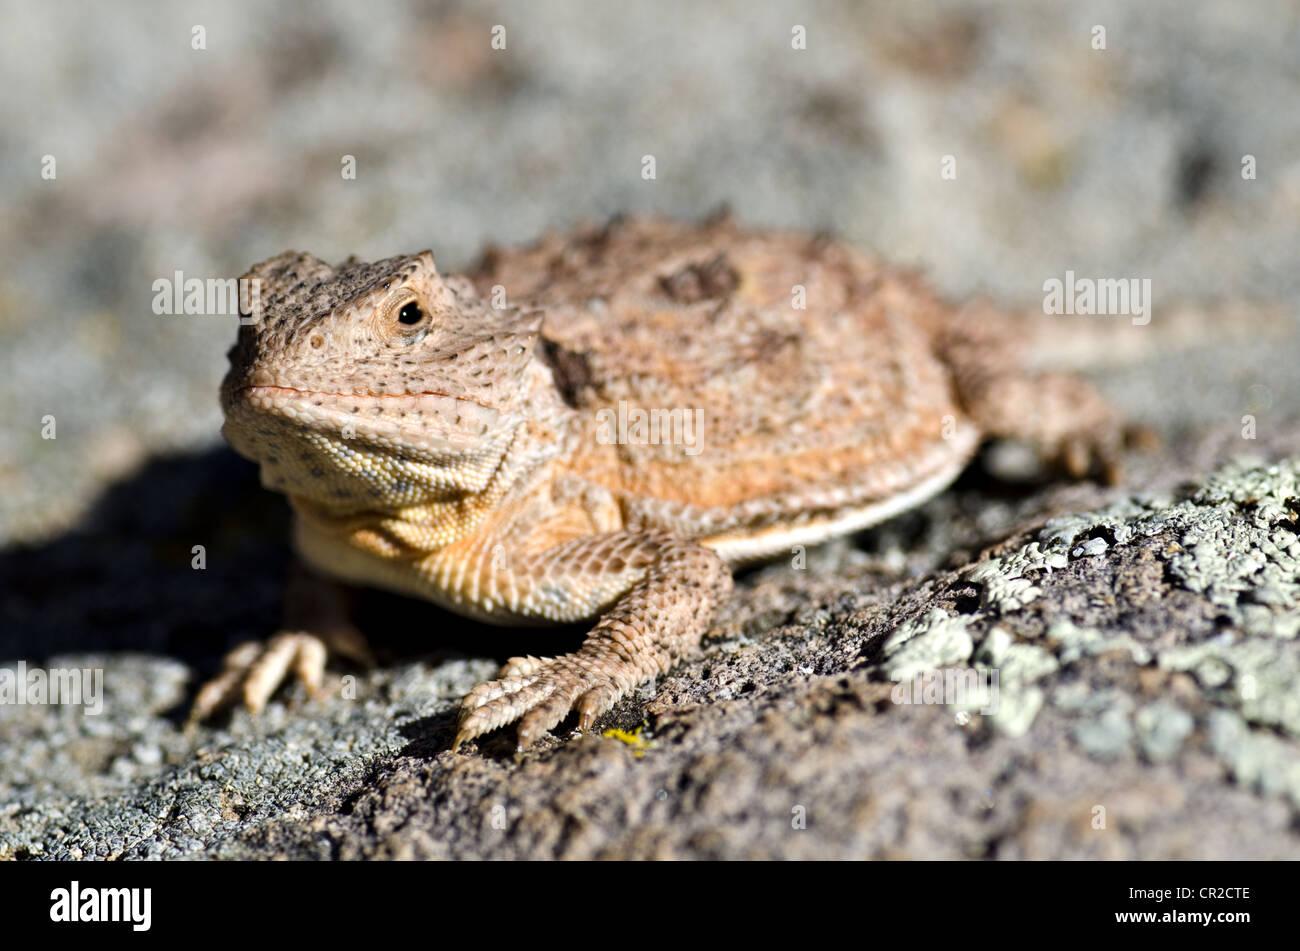 New mexico socorro county magdalena - Hernandez S Short Horned Lizard Phrynosoma Hernandezi Hernandezi Magdalena Mountains Socorro County New Mexico Usa